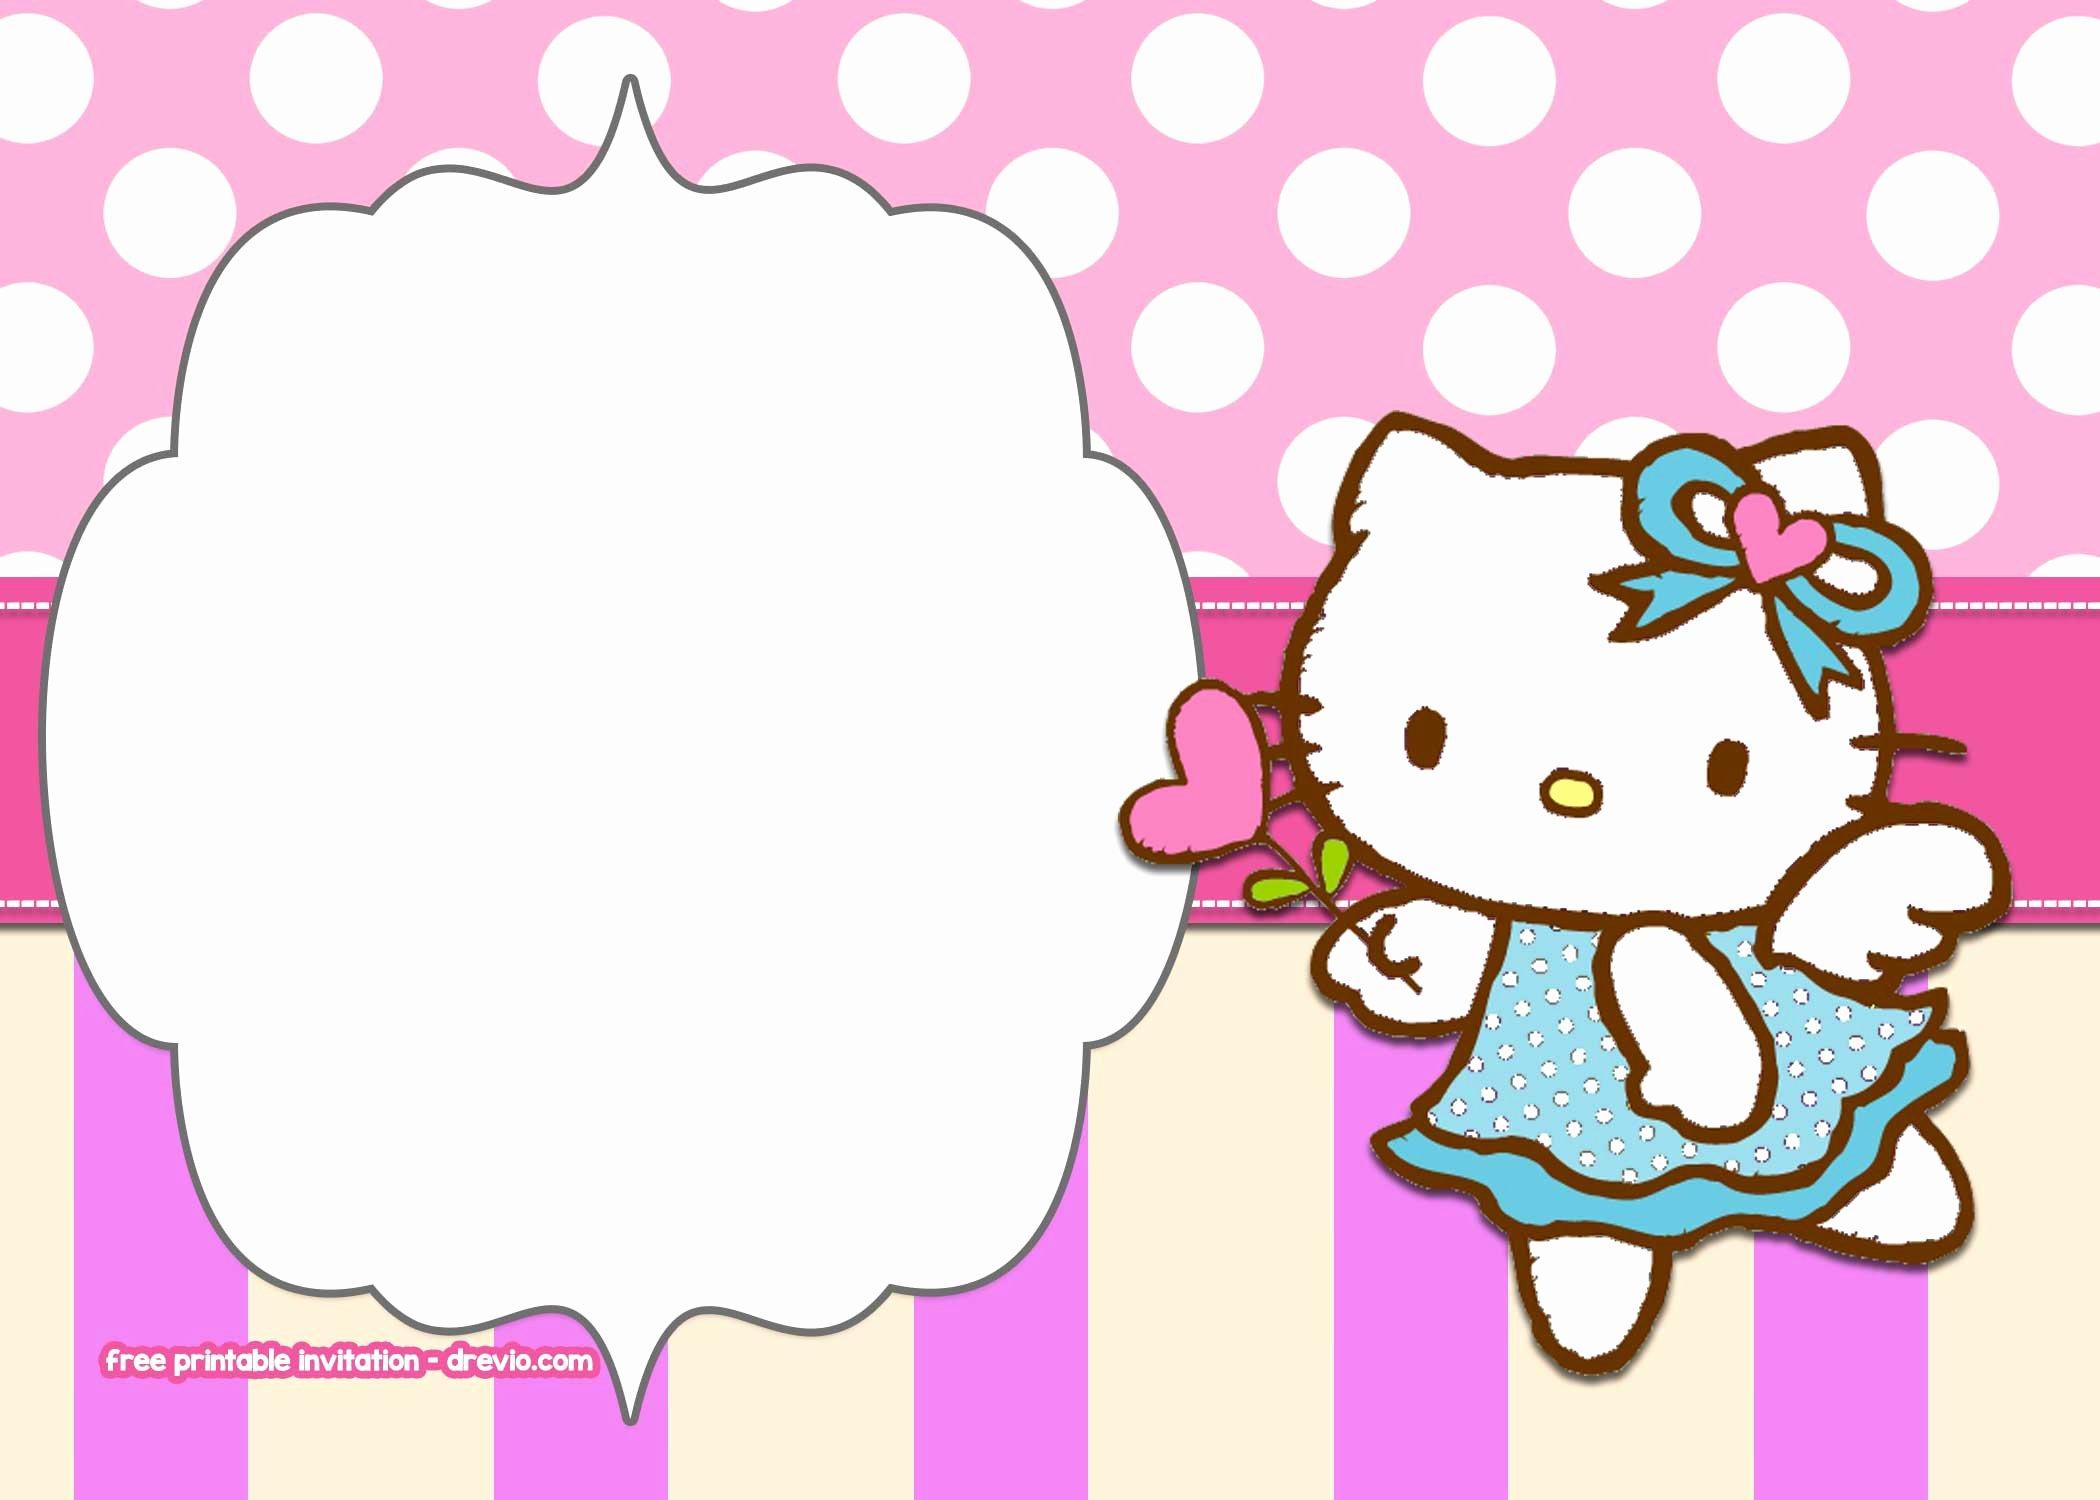 Hello Kitty Invitation Template Unique Free Printable Hello Kitty Pink Polka Dot Invitation